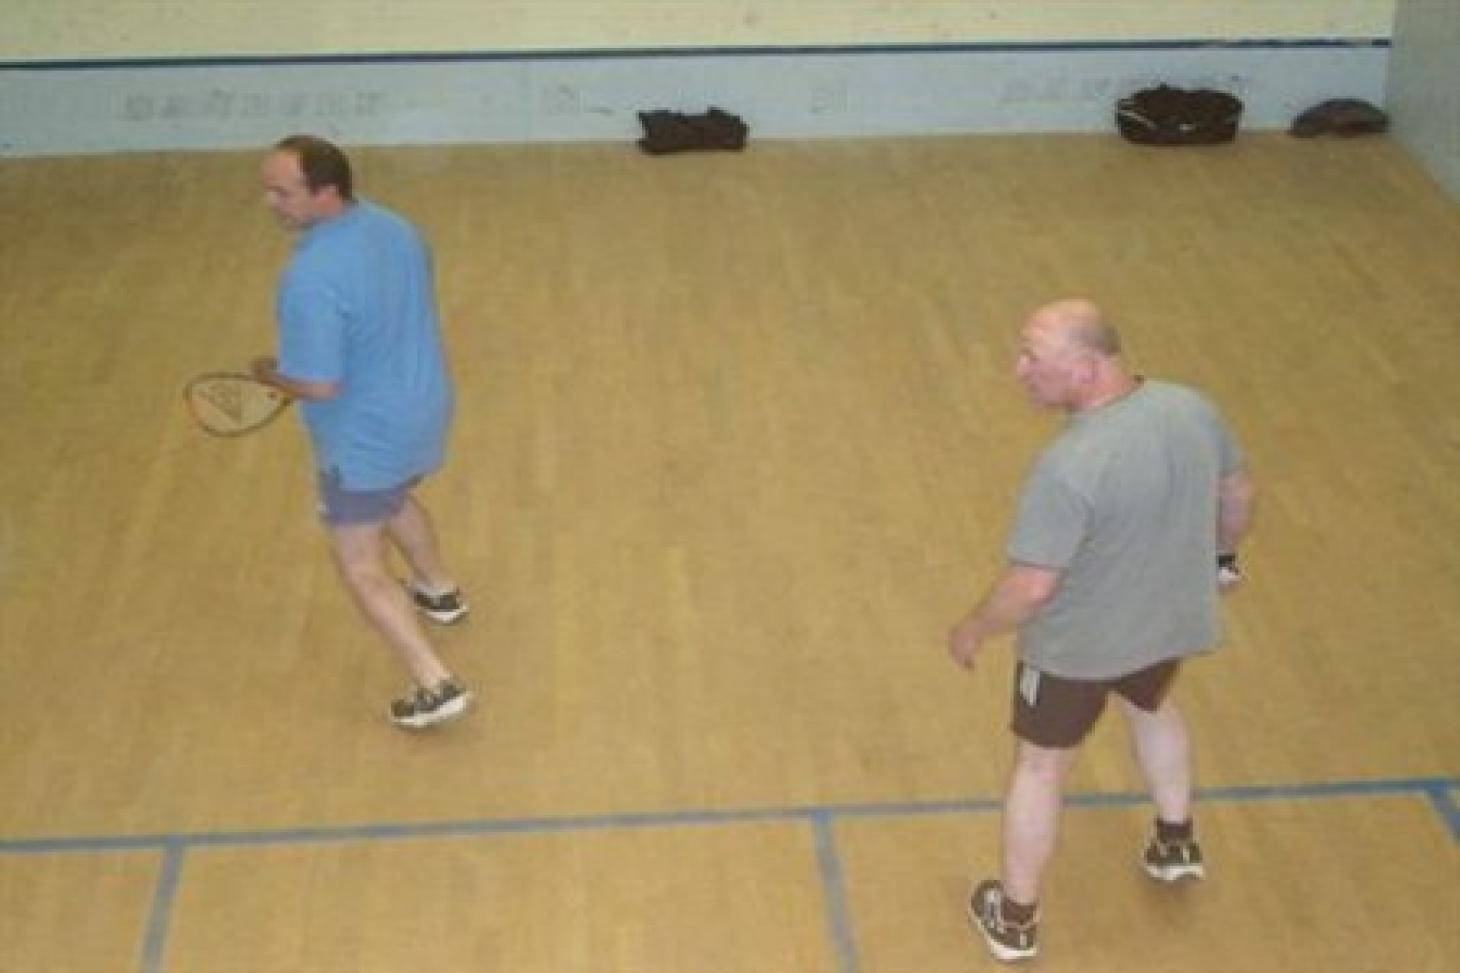 Edmonton Sports And Social Club Indoor | Hard squash court